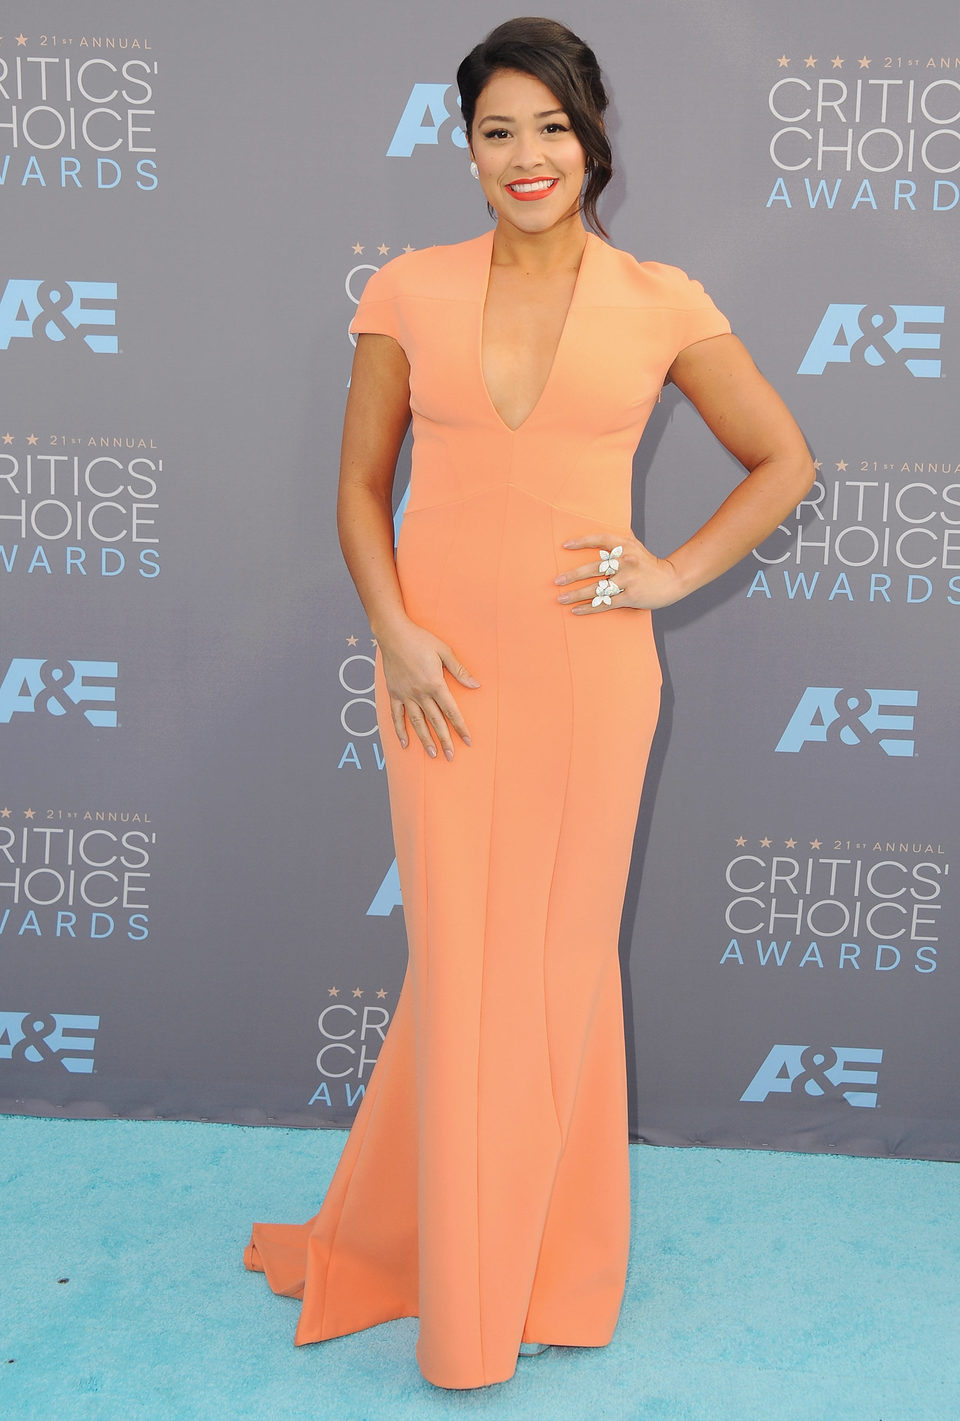 Gina Rodríguez minutos antes de la gala de los Critics Choice Awards 2016